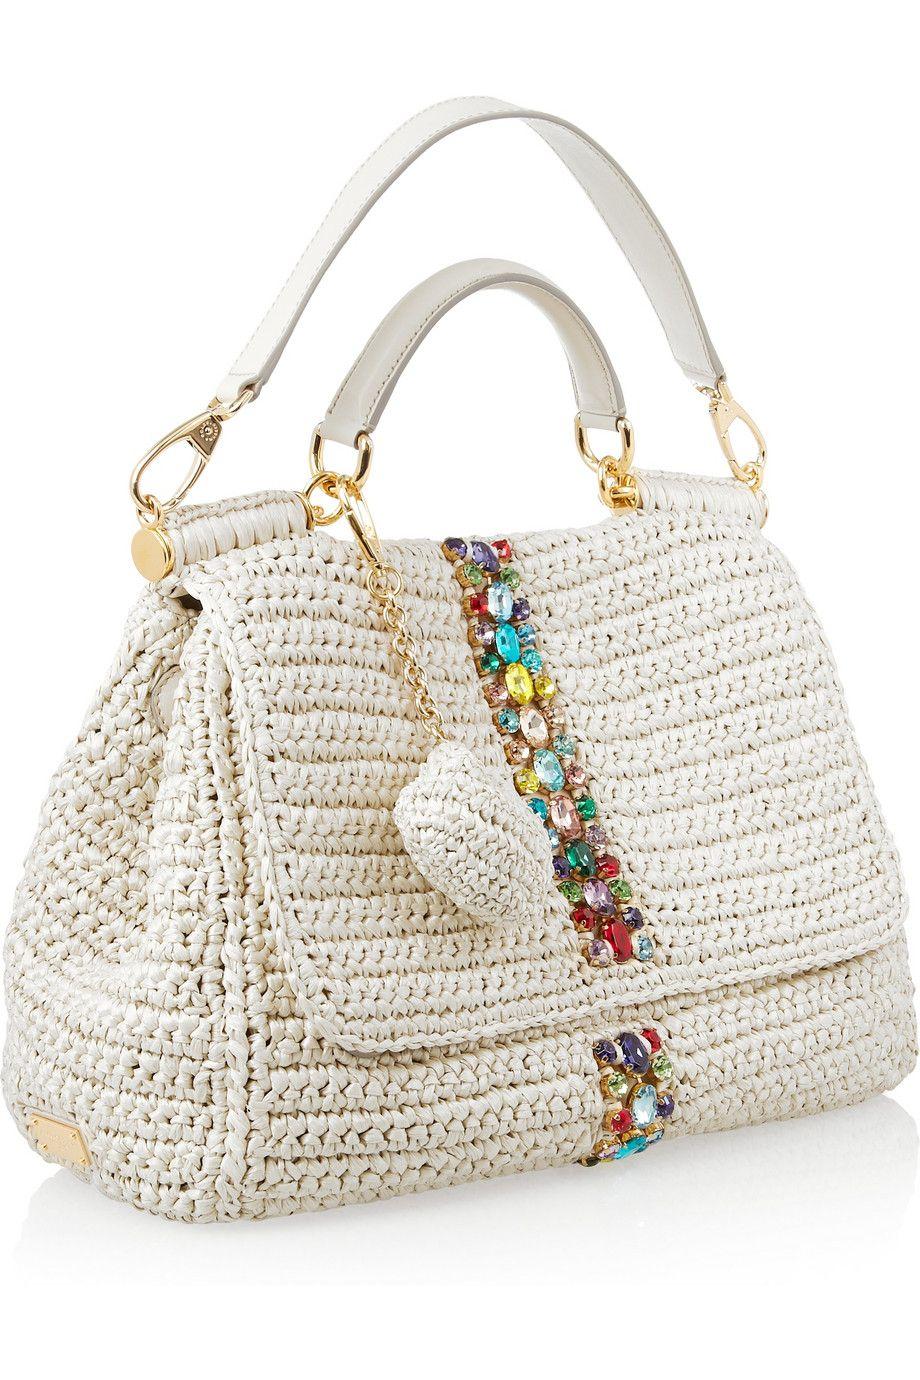 Dolce & Gabbana Raffia and leather shoulder bag | Bolsos y carteras ...